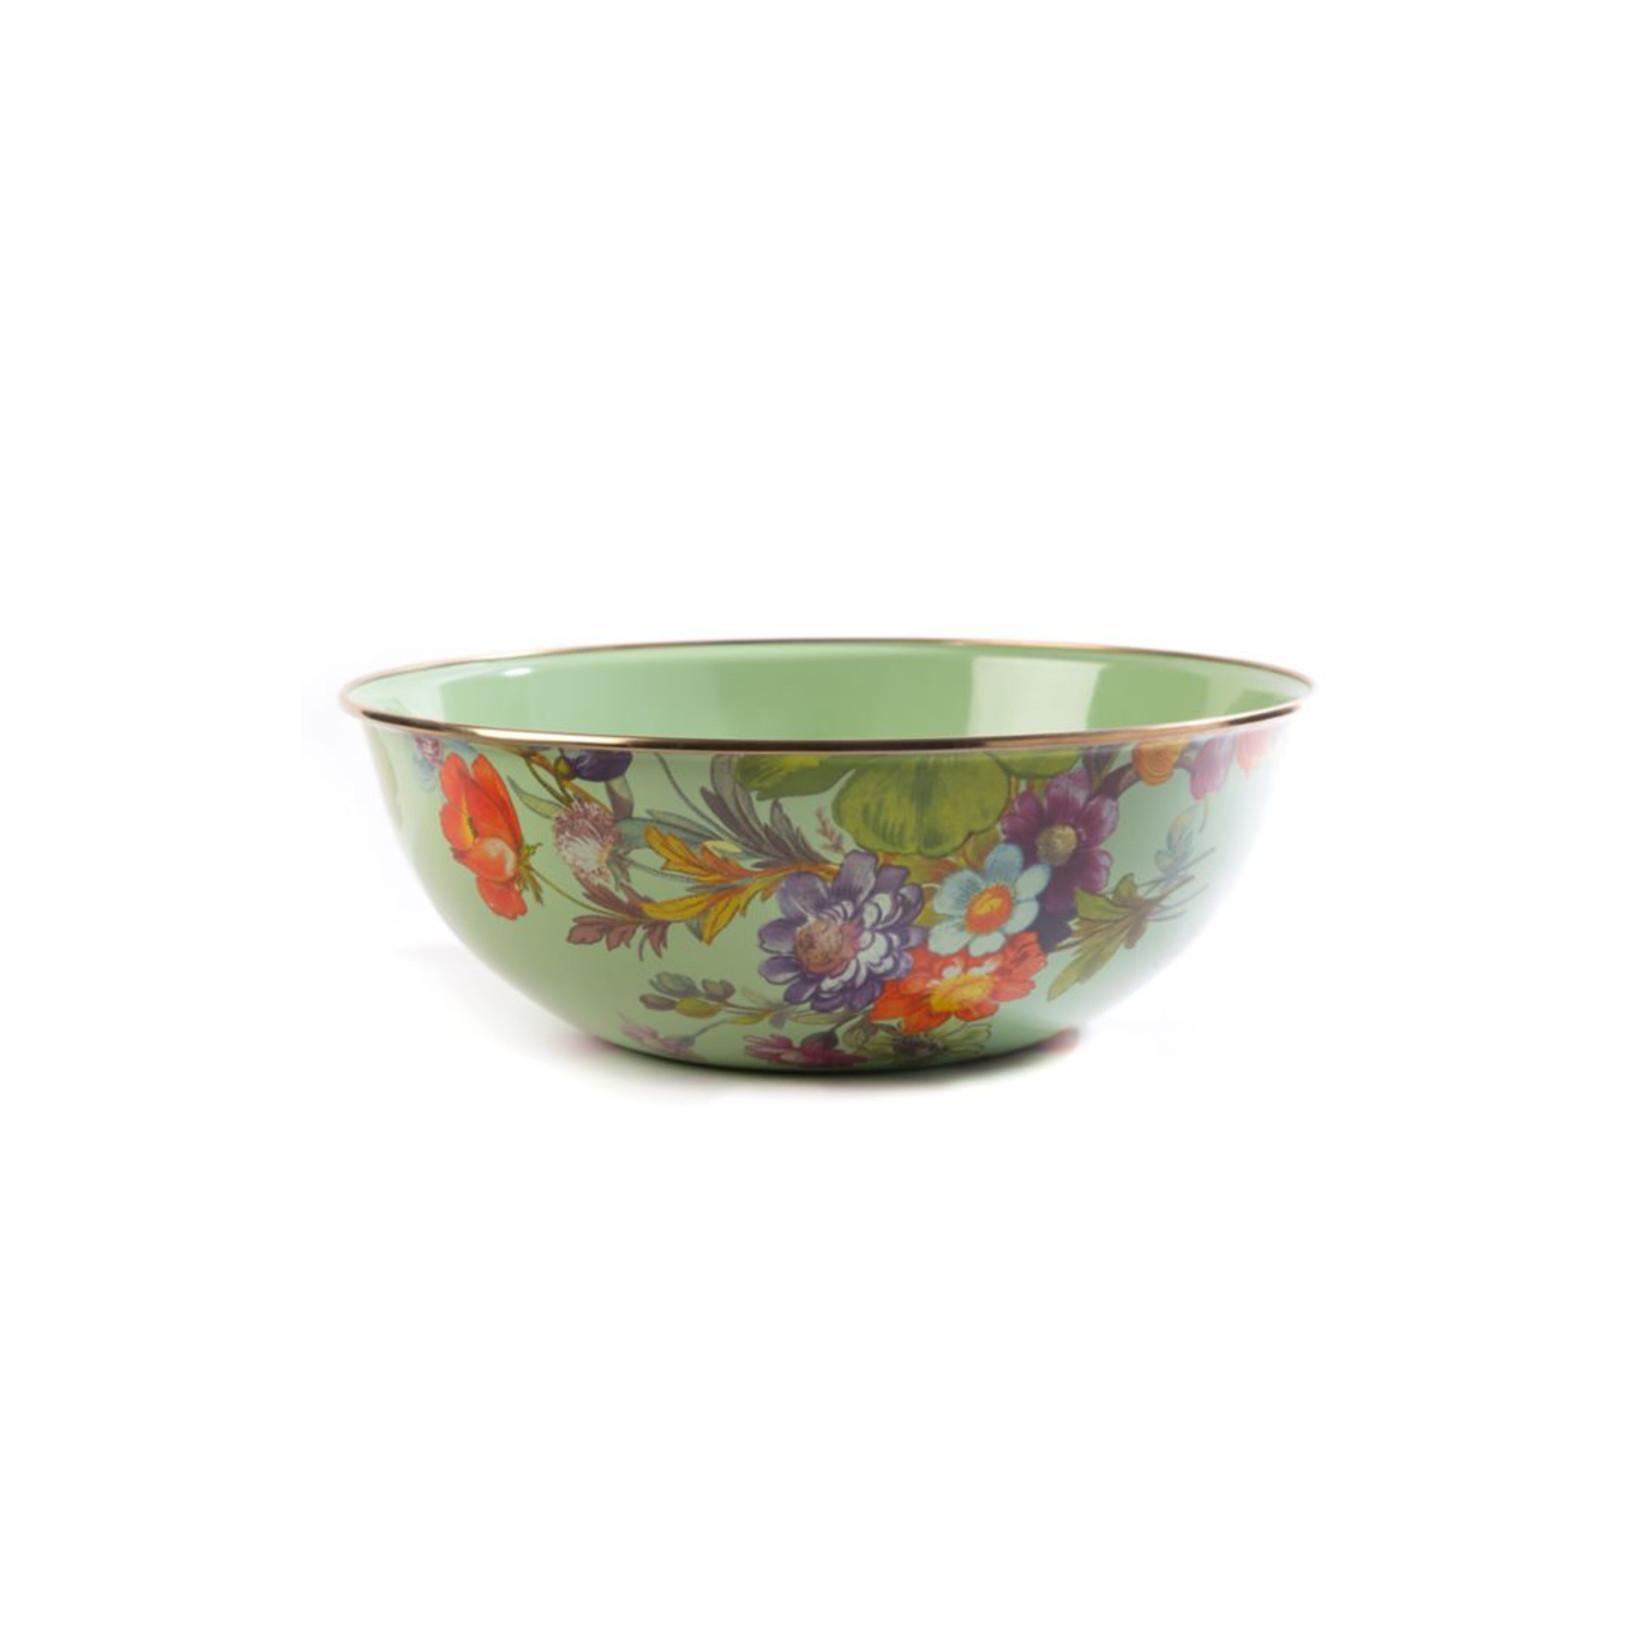 MacKenzie Childs Flower Market Extra Large Everyday Bowl - Green